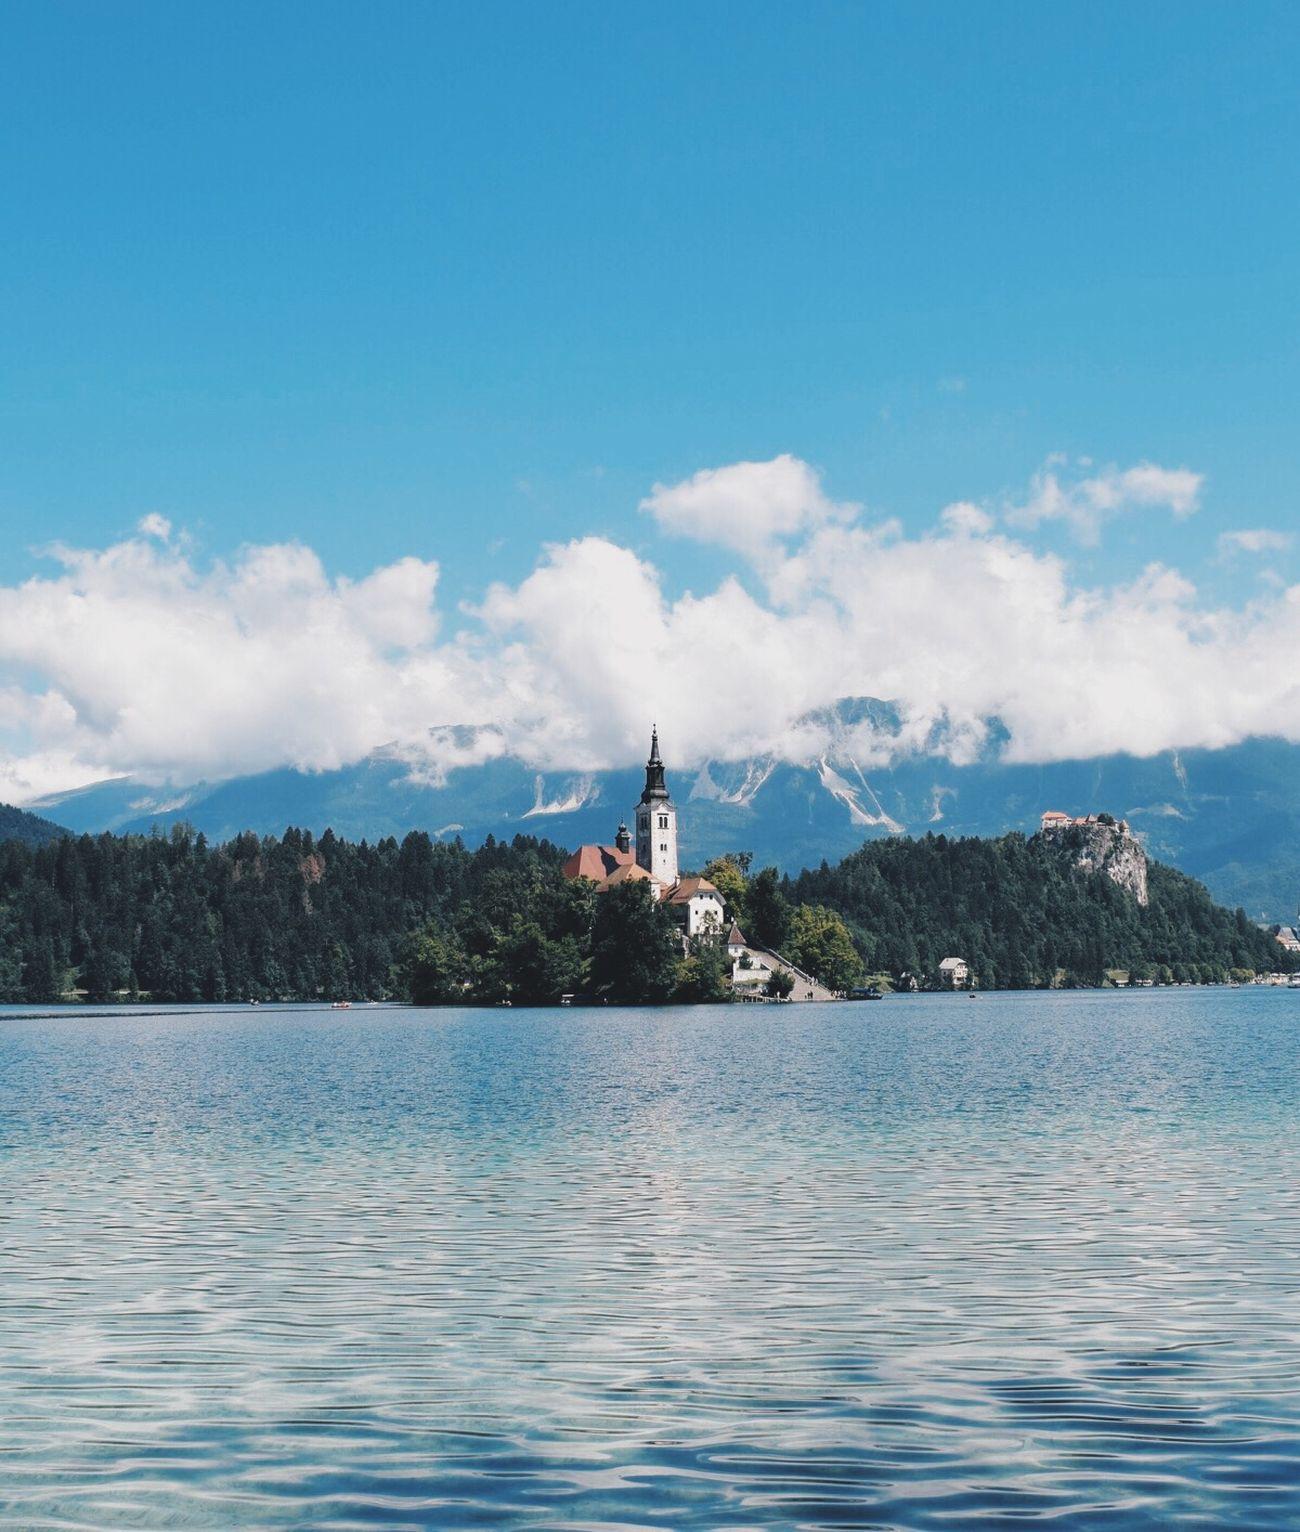 blue. water - land - mountain. Slovenia Mountains Alps Lake Slovenian Alps